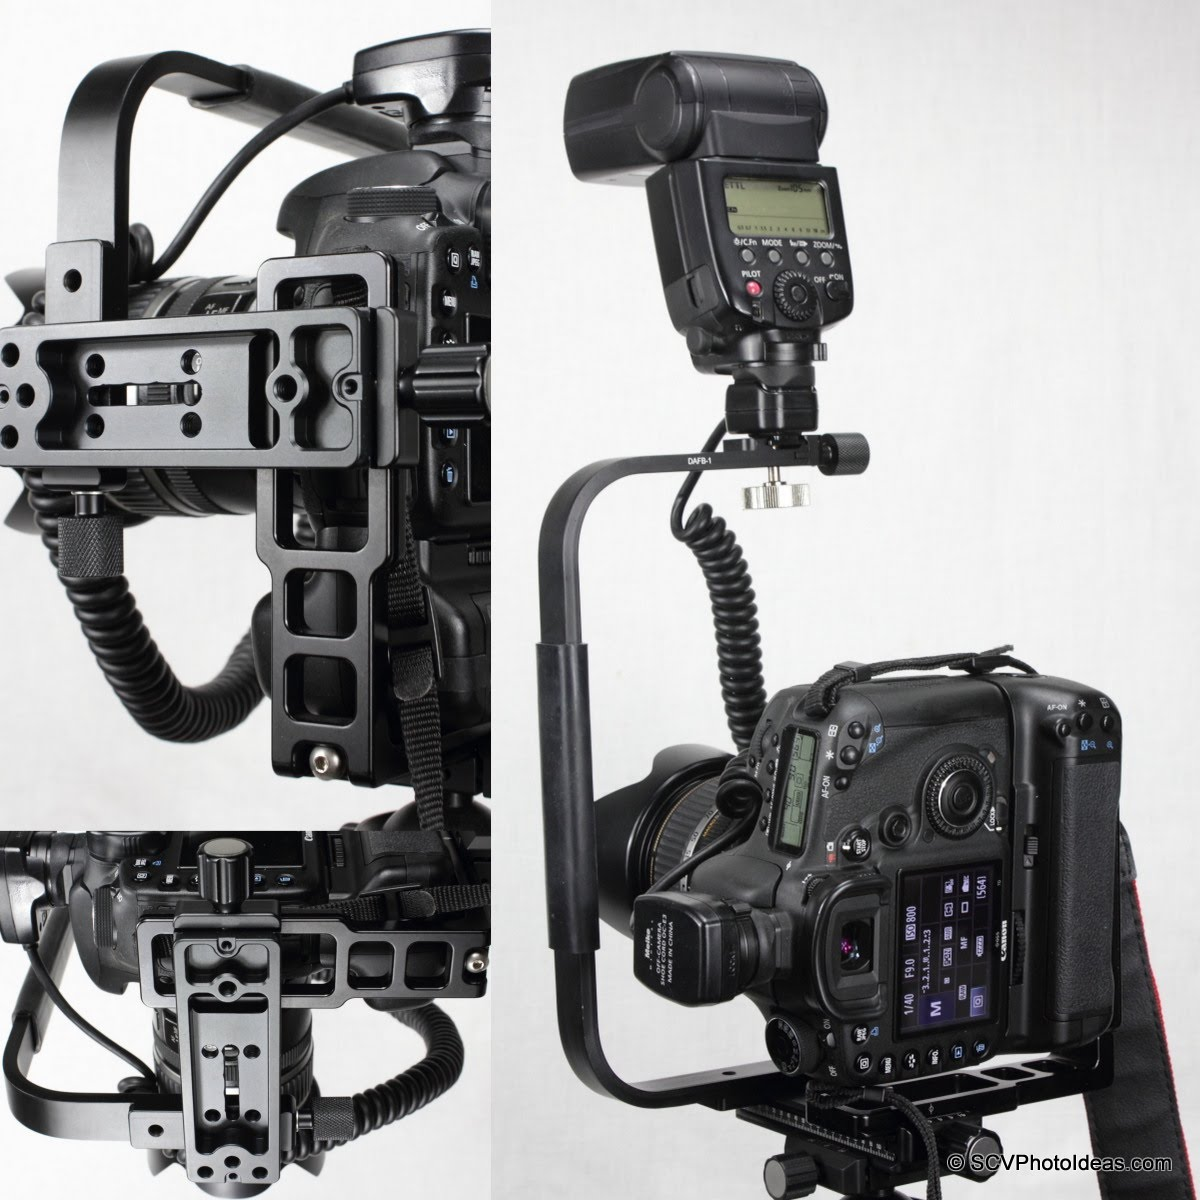 Hejnar L Bracket 44 on Gripped Canon EOS 7D -clamped on slide w/ flash bracket